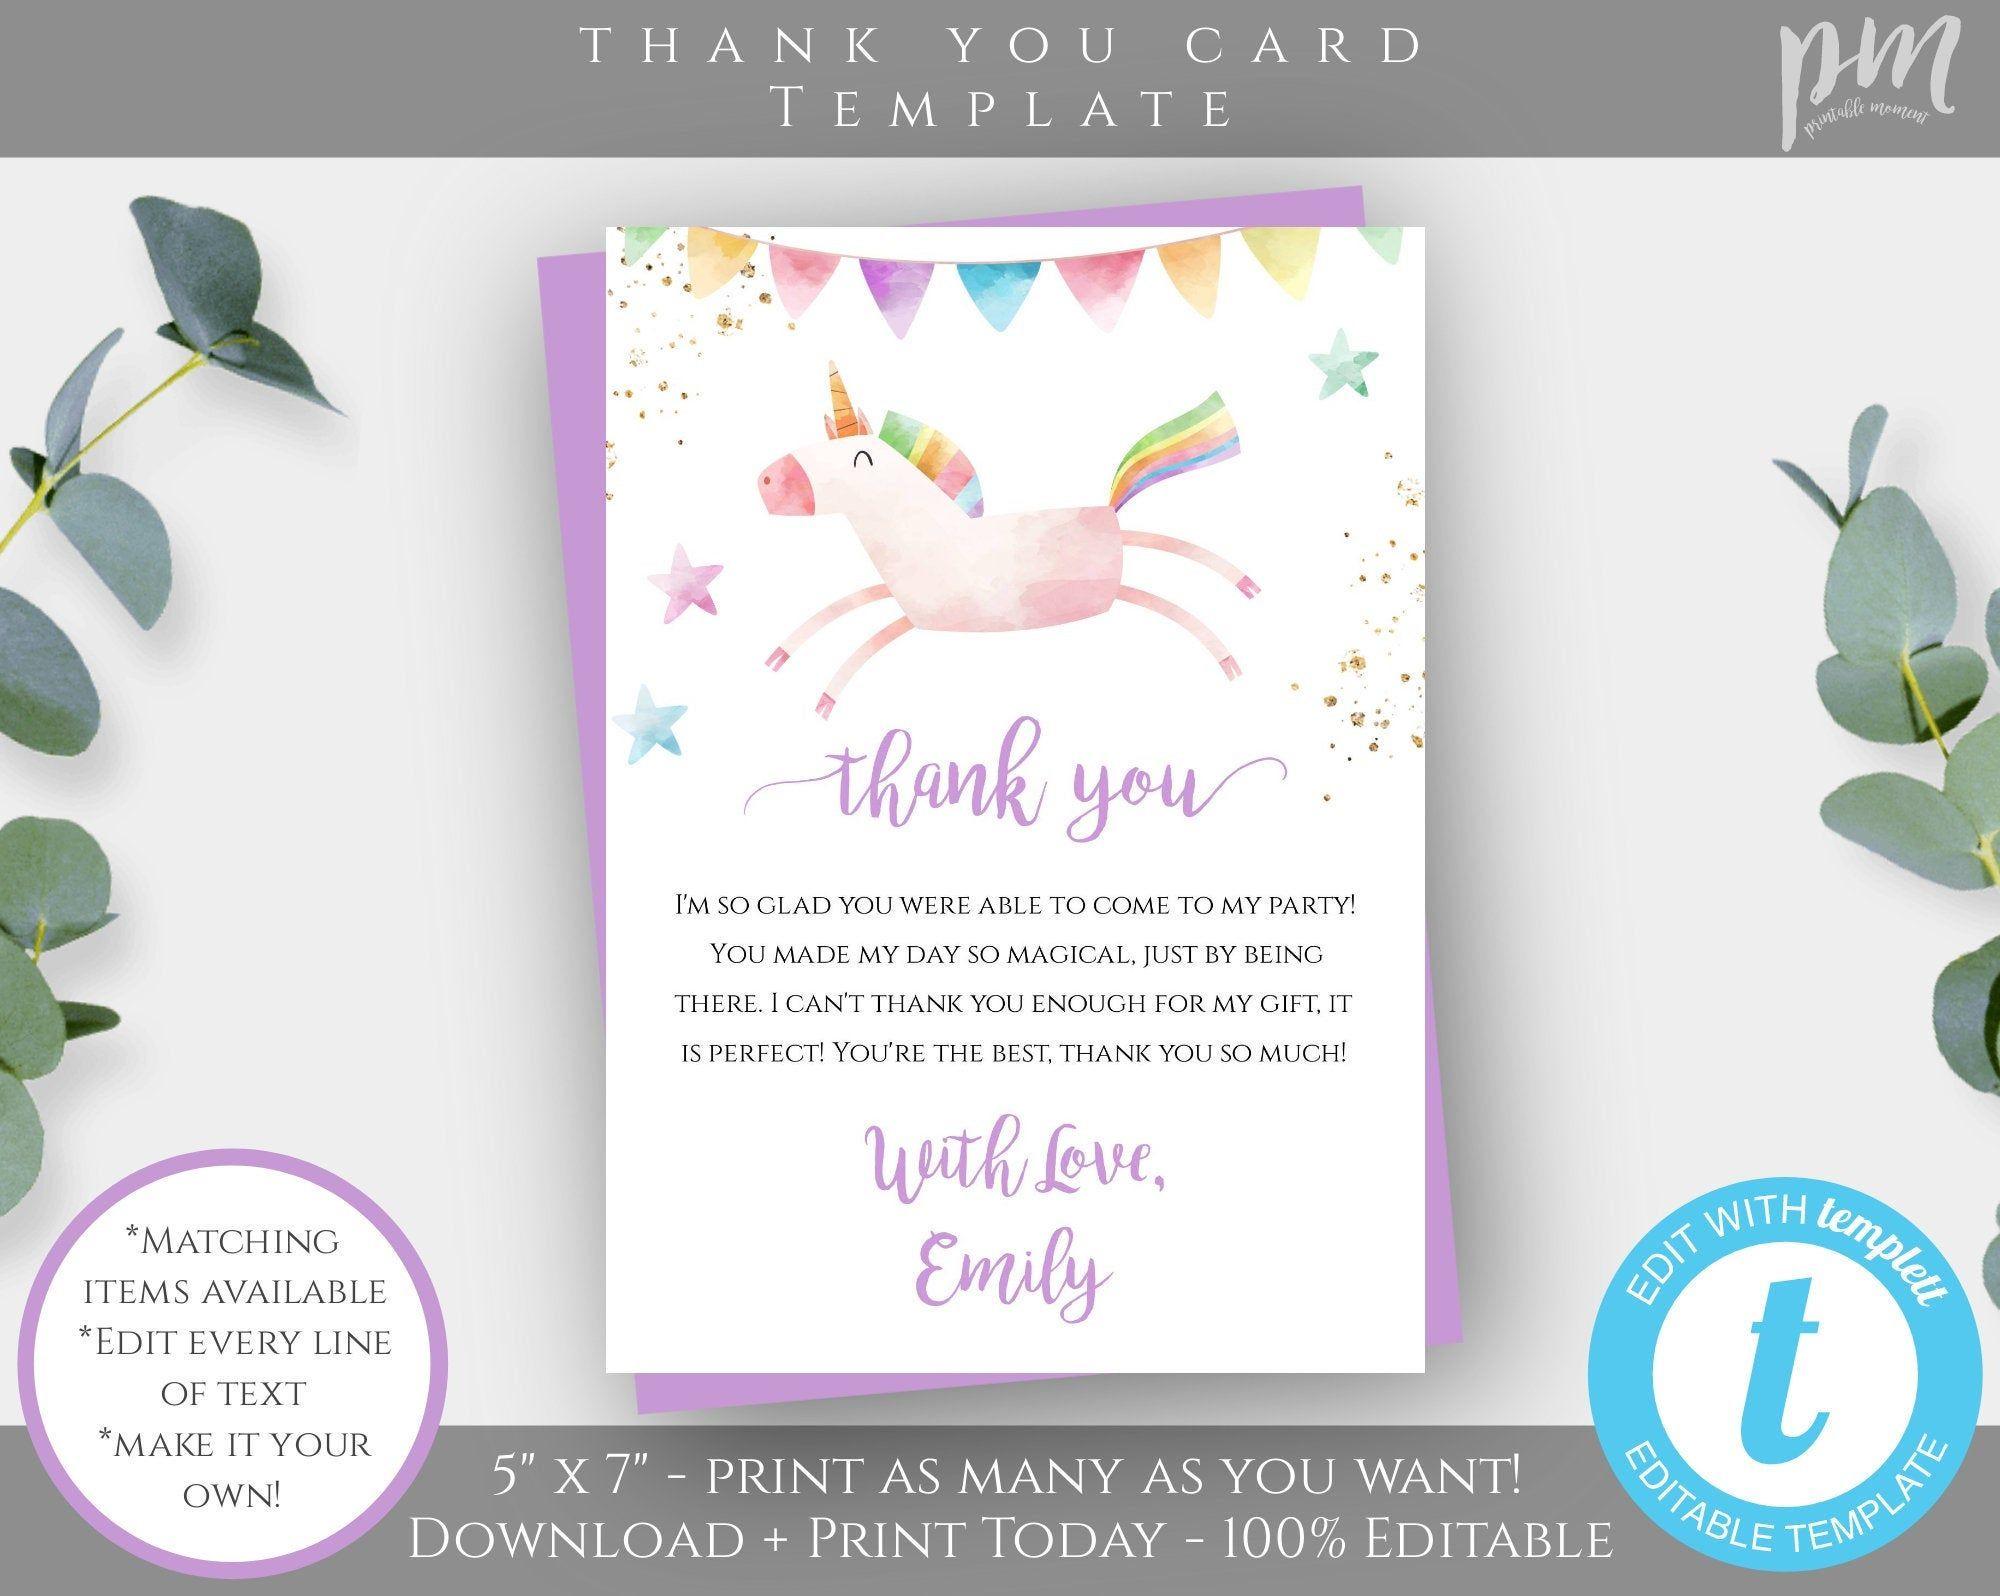 unicorn thank you card template for birthday editable 5x7